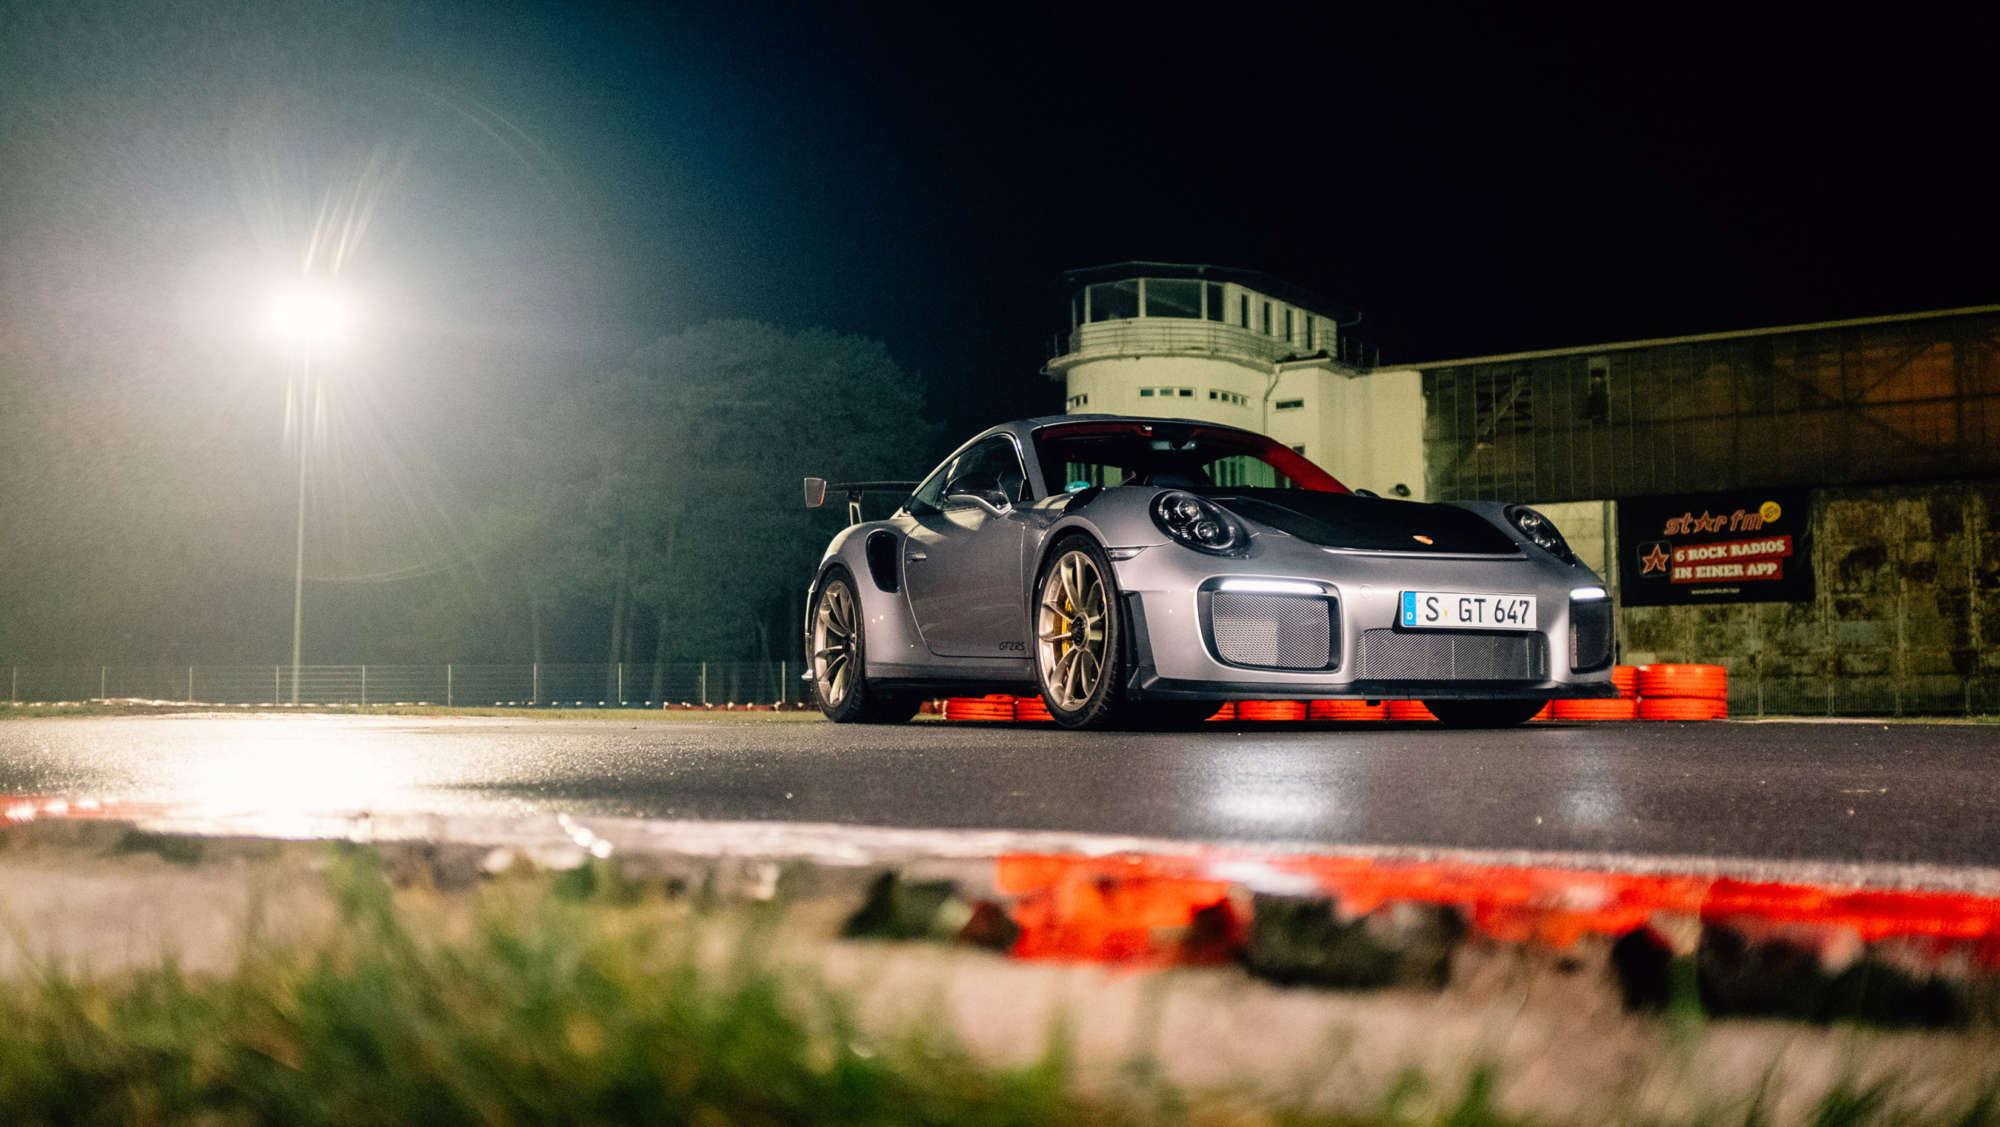 GT2 RS on a go-kart track